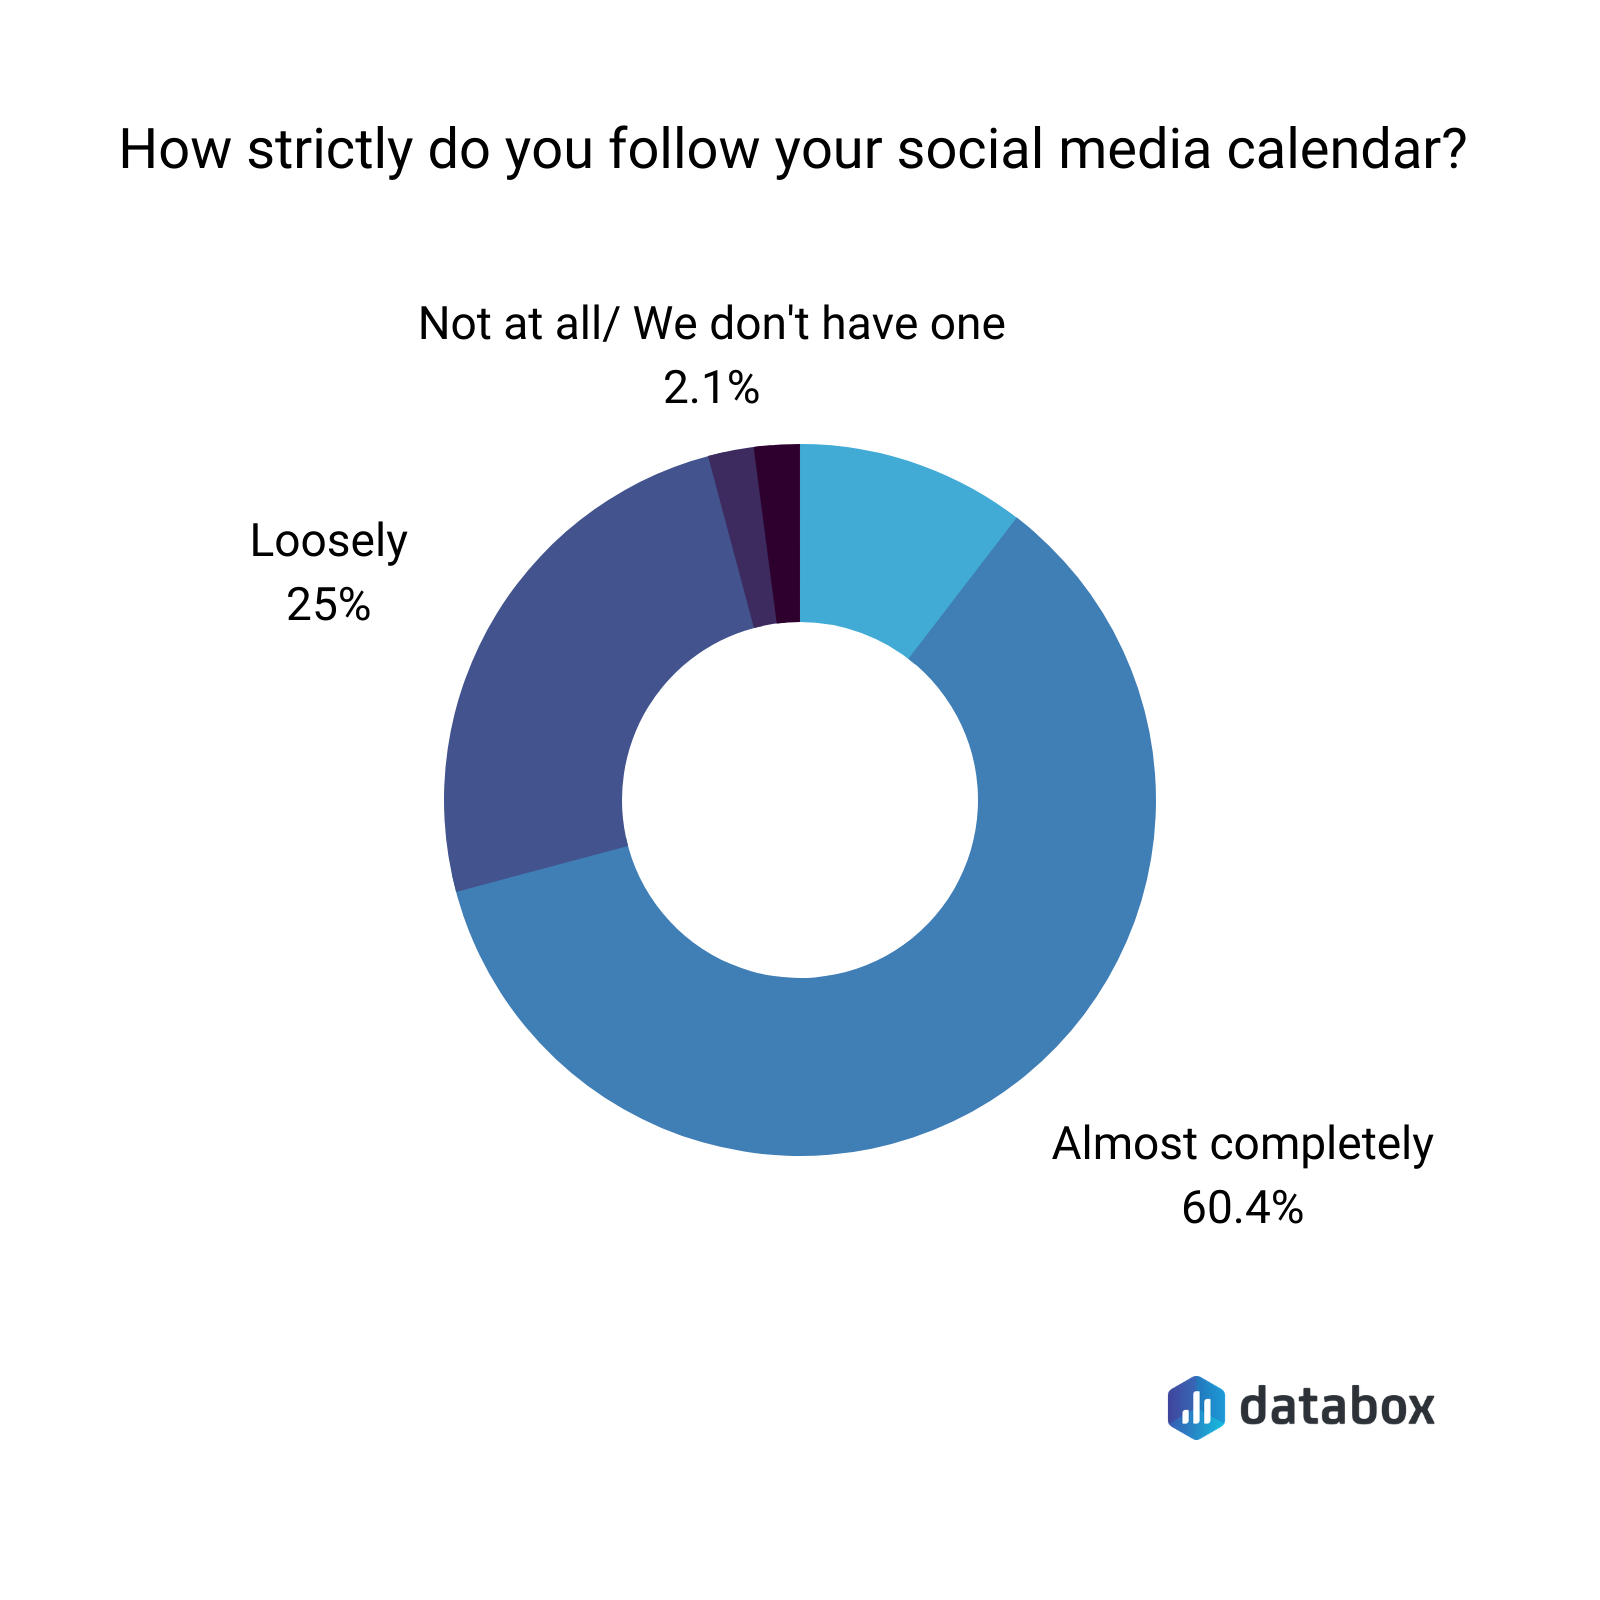 how strictly do you follow your social media calendar